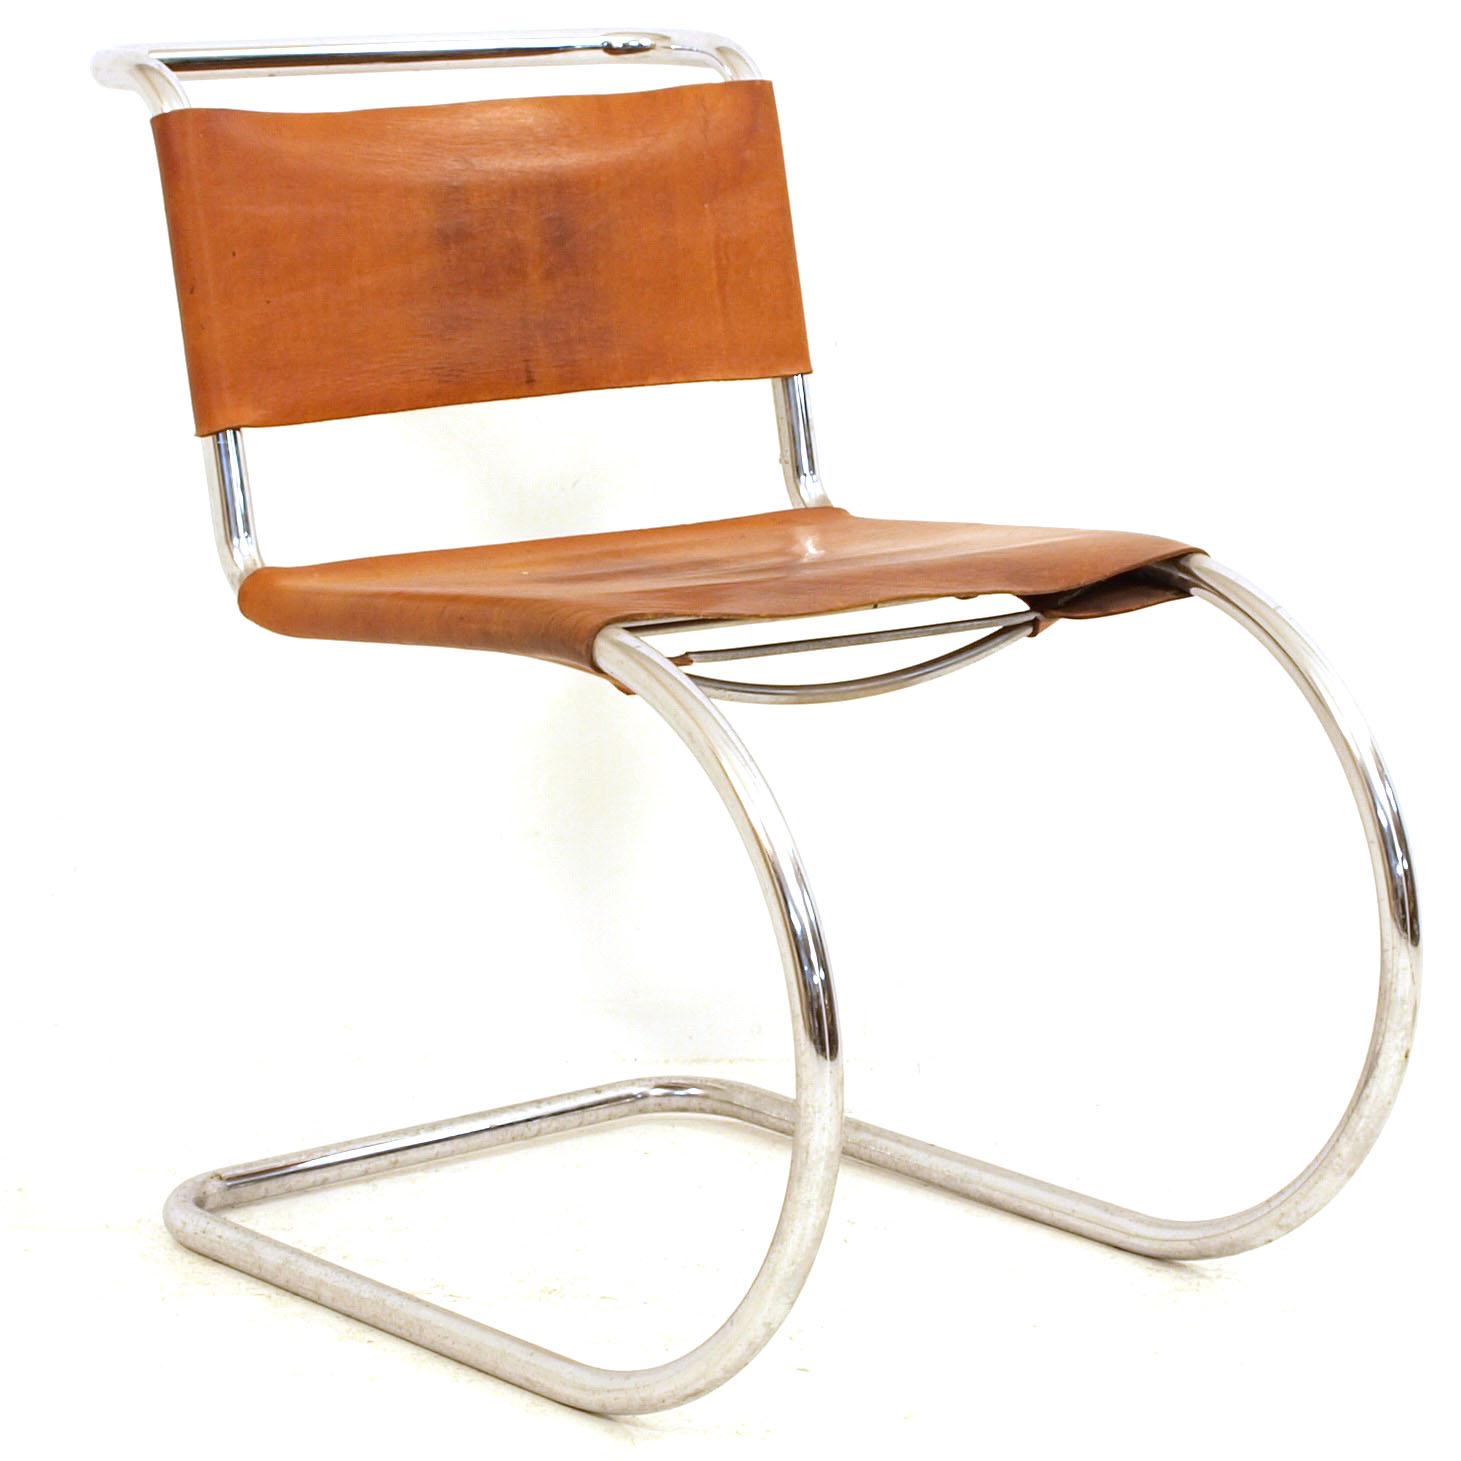 freischwinger bauhaus einzelst ck m bel z rich vintagem bel. Black Bedroom Furniture Sets. Home Design Ideas